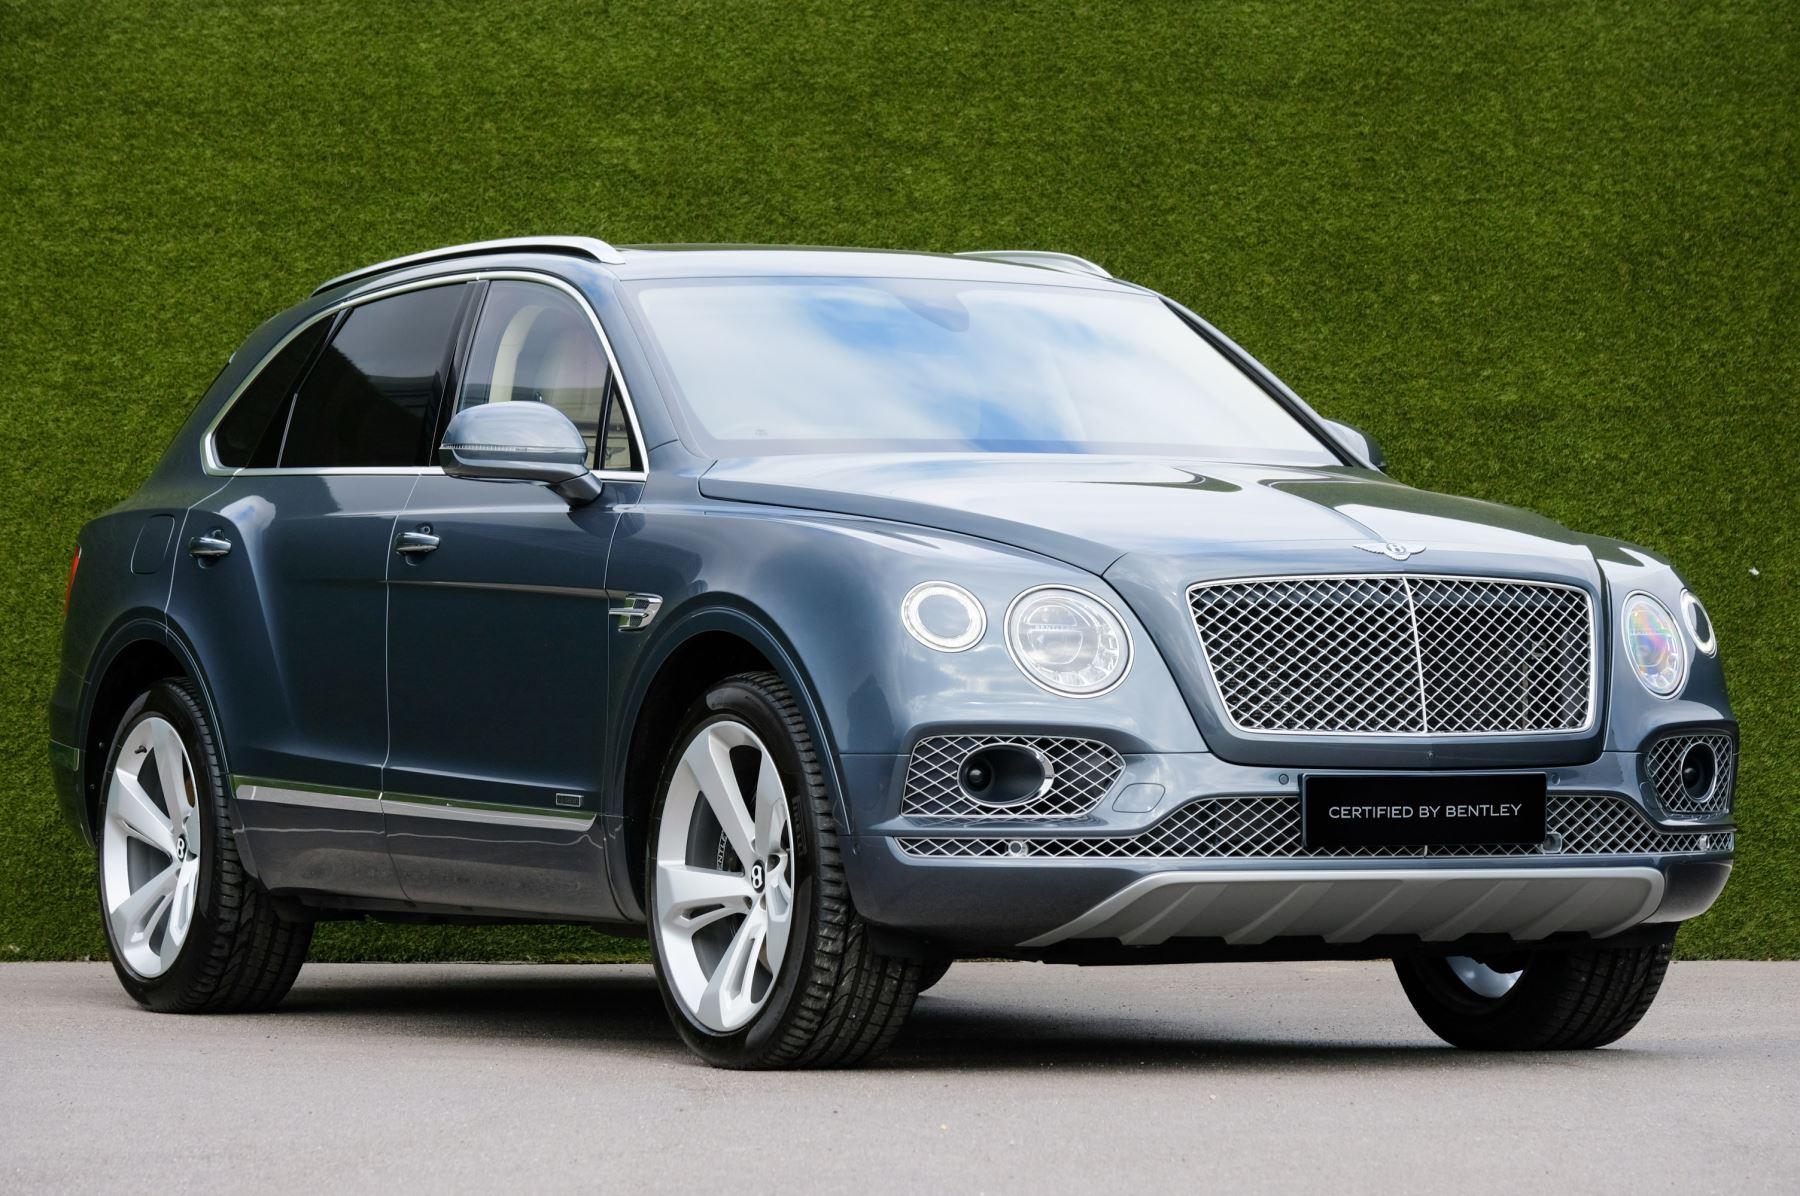 Bentley Bentayga 4.0 V8 5dr - Mulliner Driving Specification - City & Tour Specification image 1